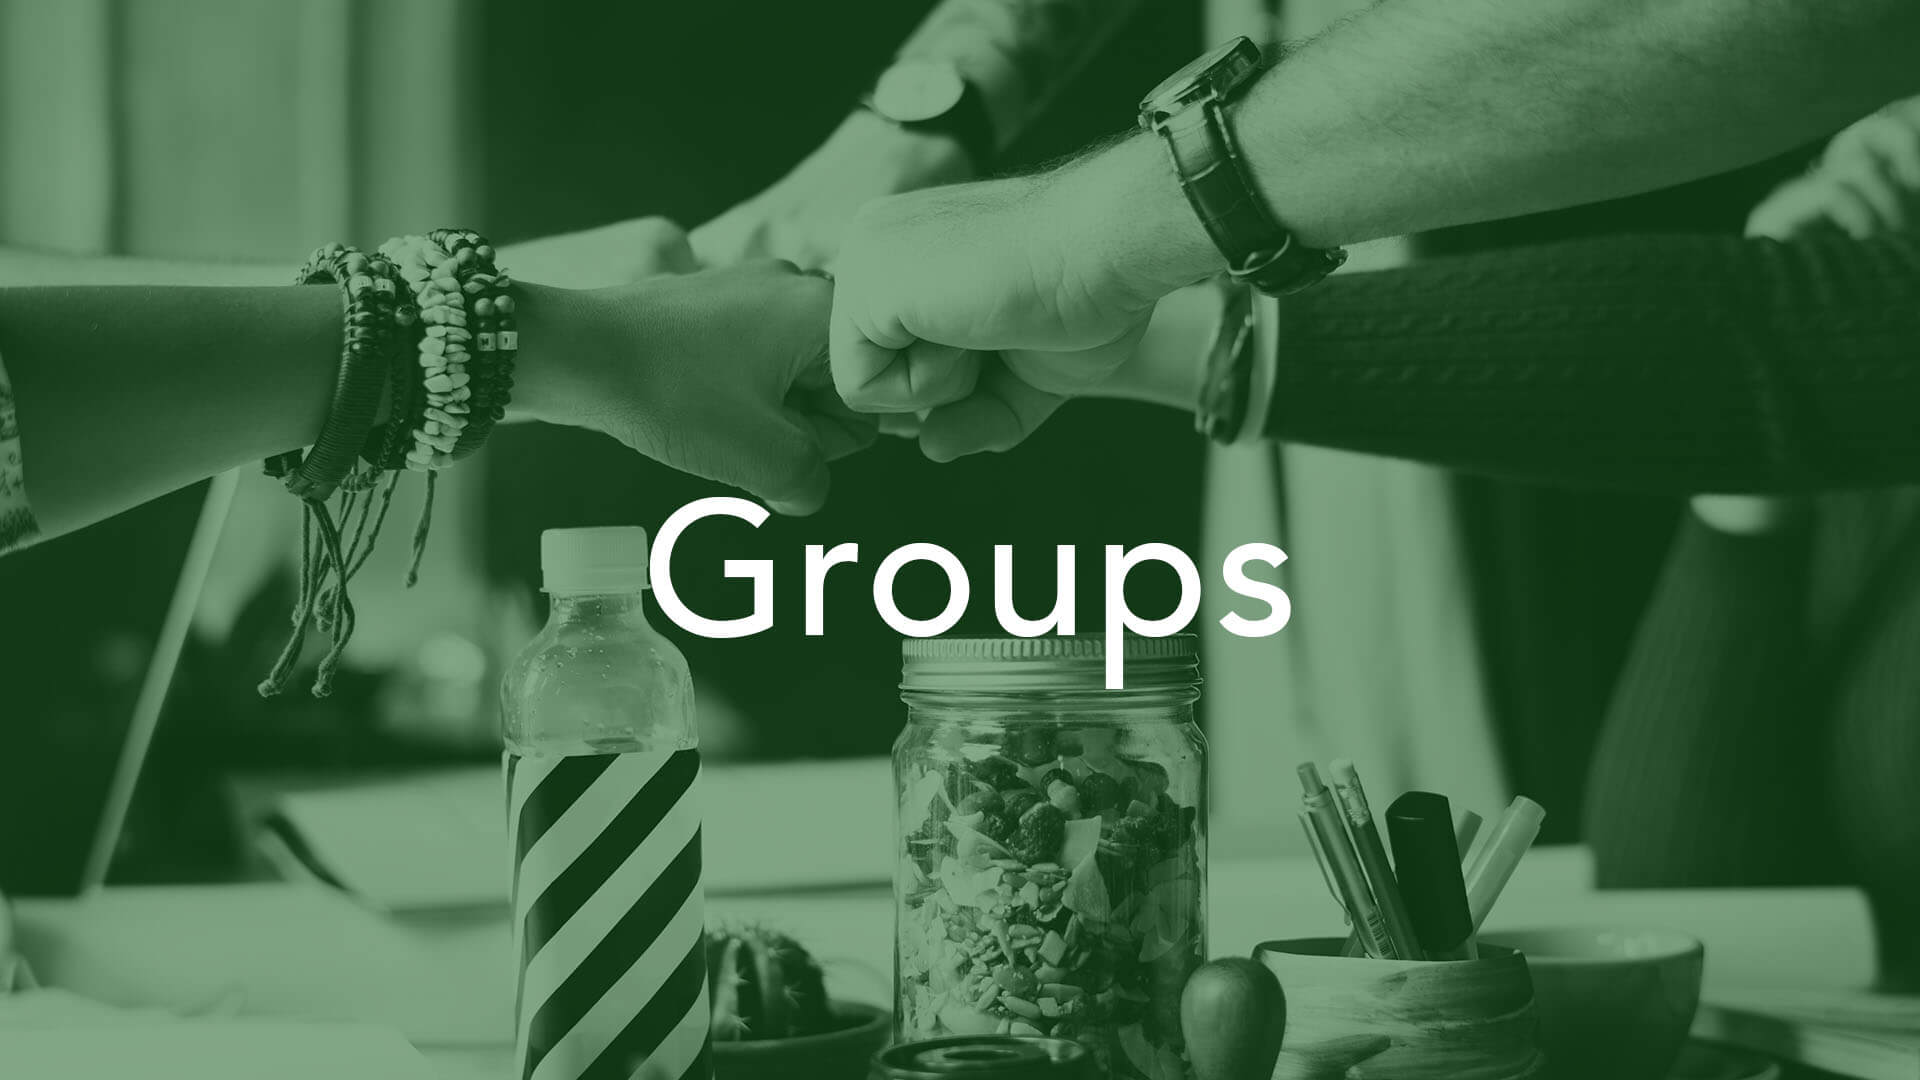 Groupslight